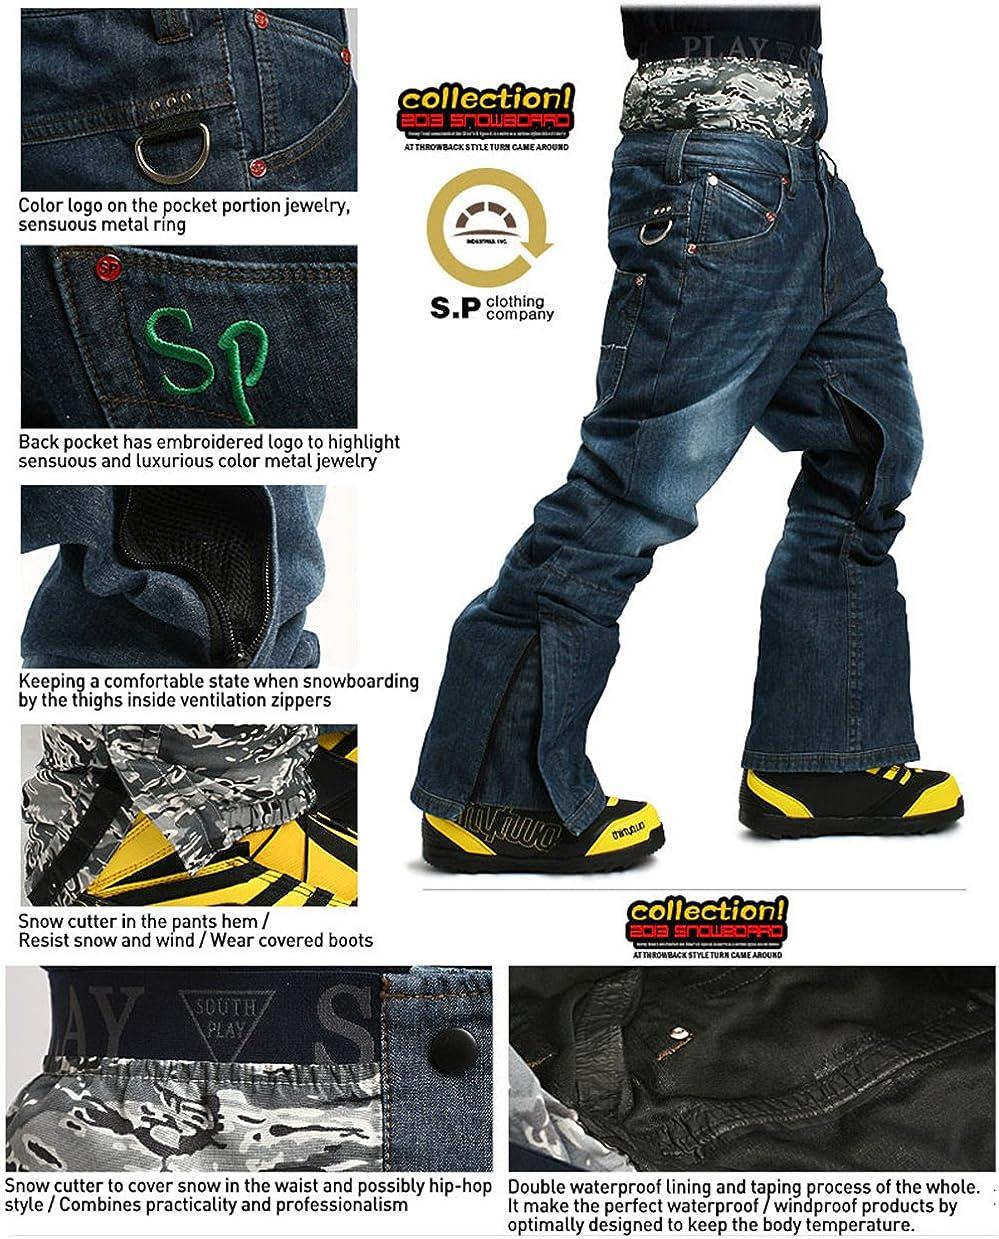 South Play Ski Snowboard Wear Suit Parka Jacket+Pants Trousers Set Khaki+Jeans